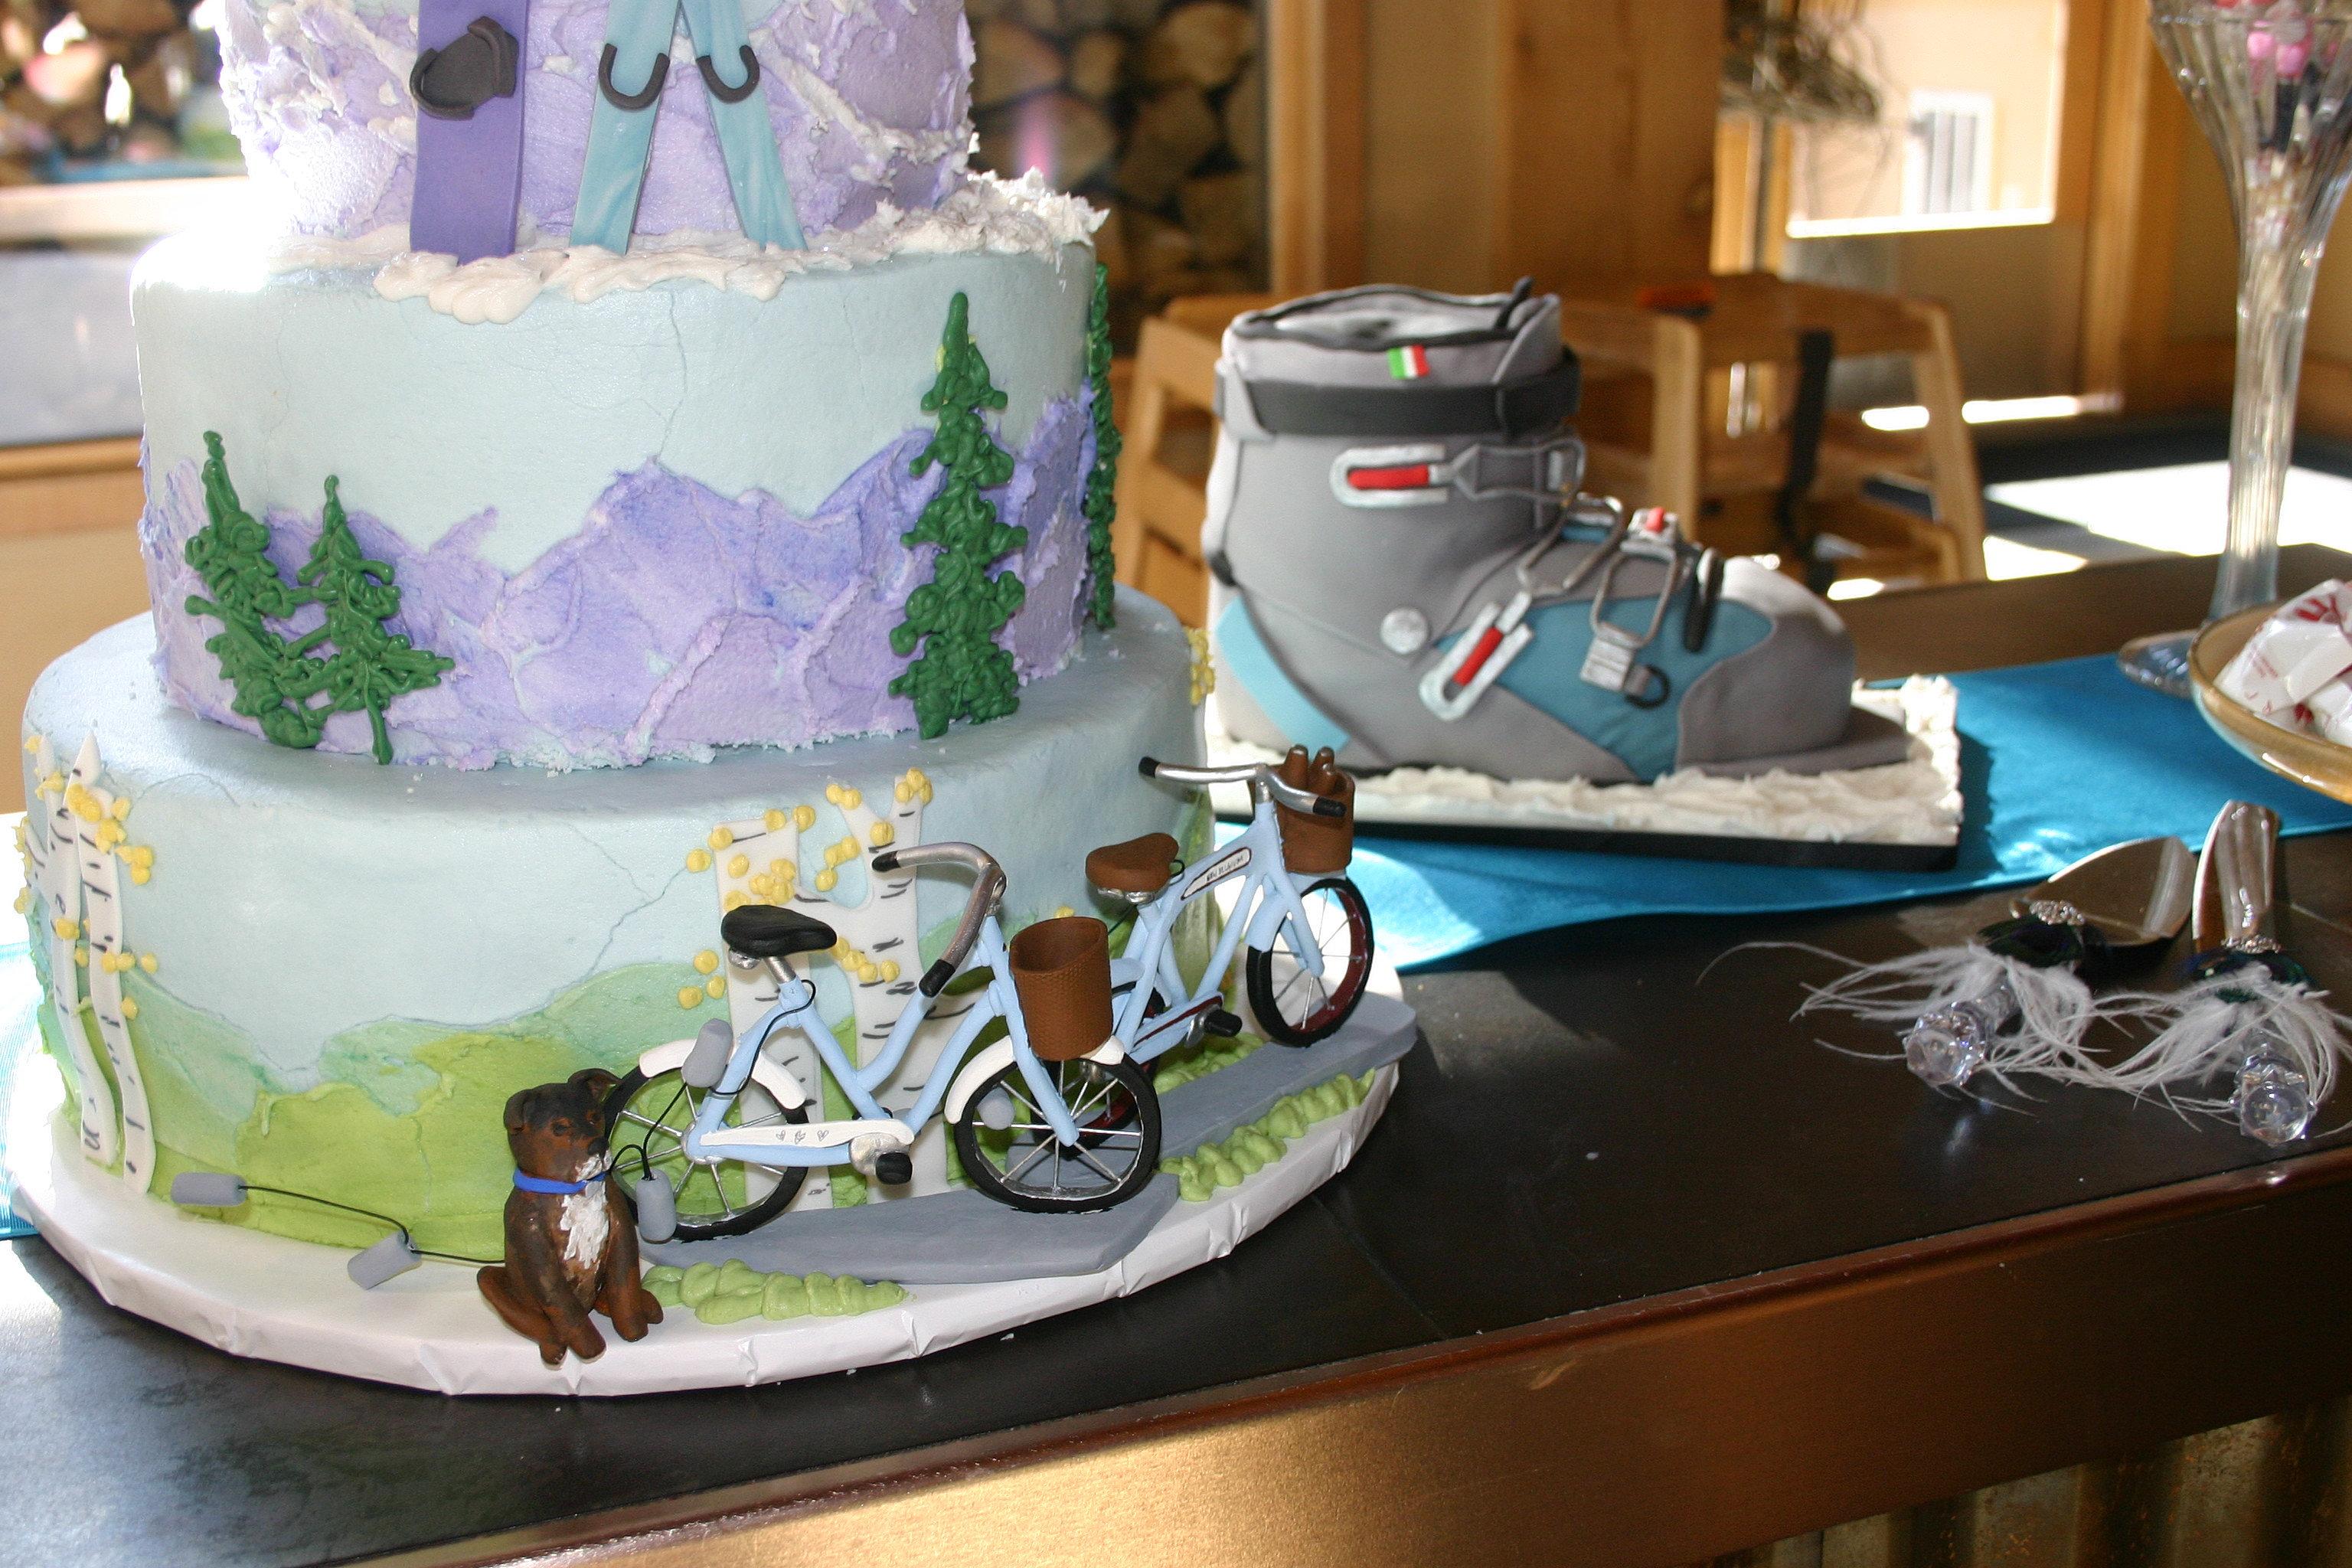 When To Start Making A Fondant Wedding Cake